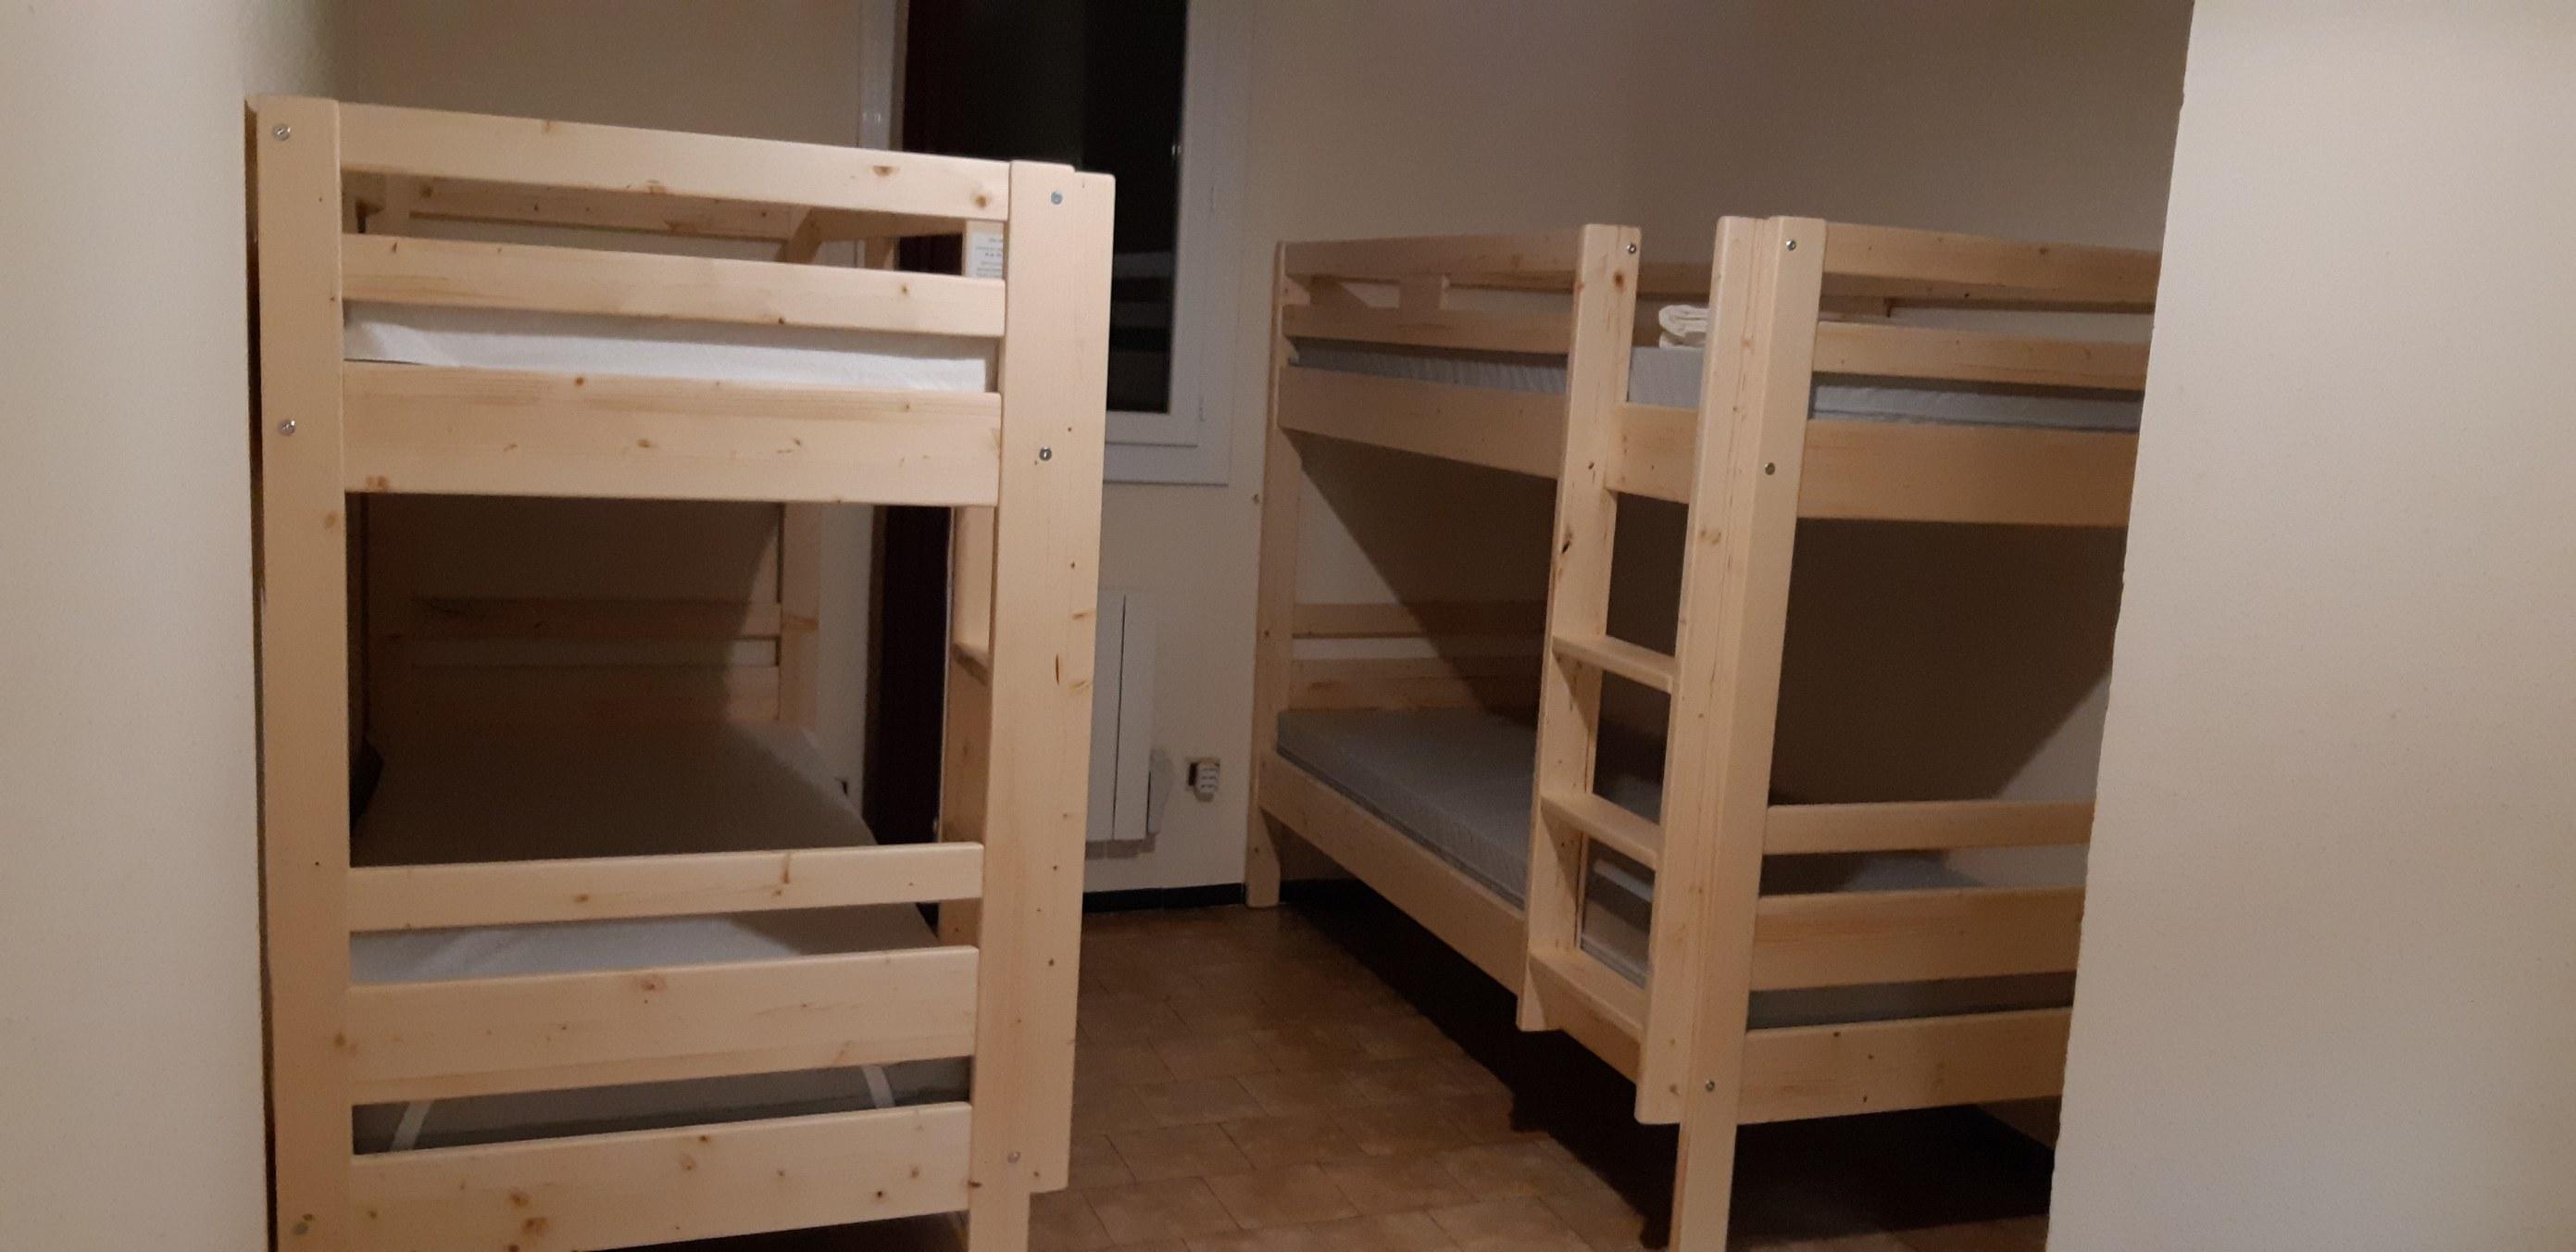 dortoirs de 4